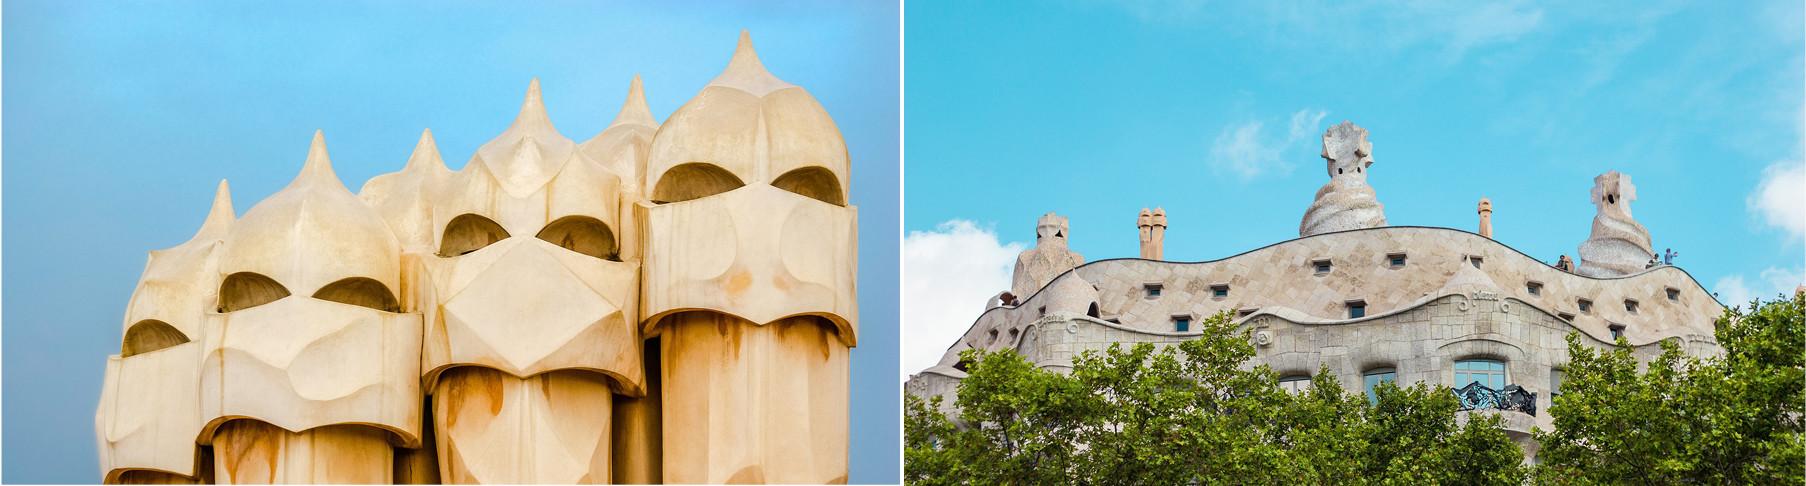 Image-Gaudi-Architecture-Barcelona